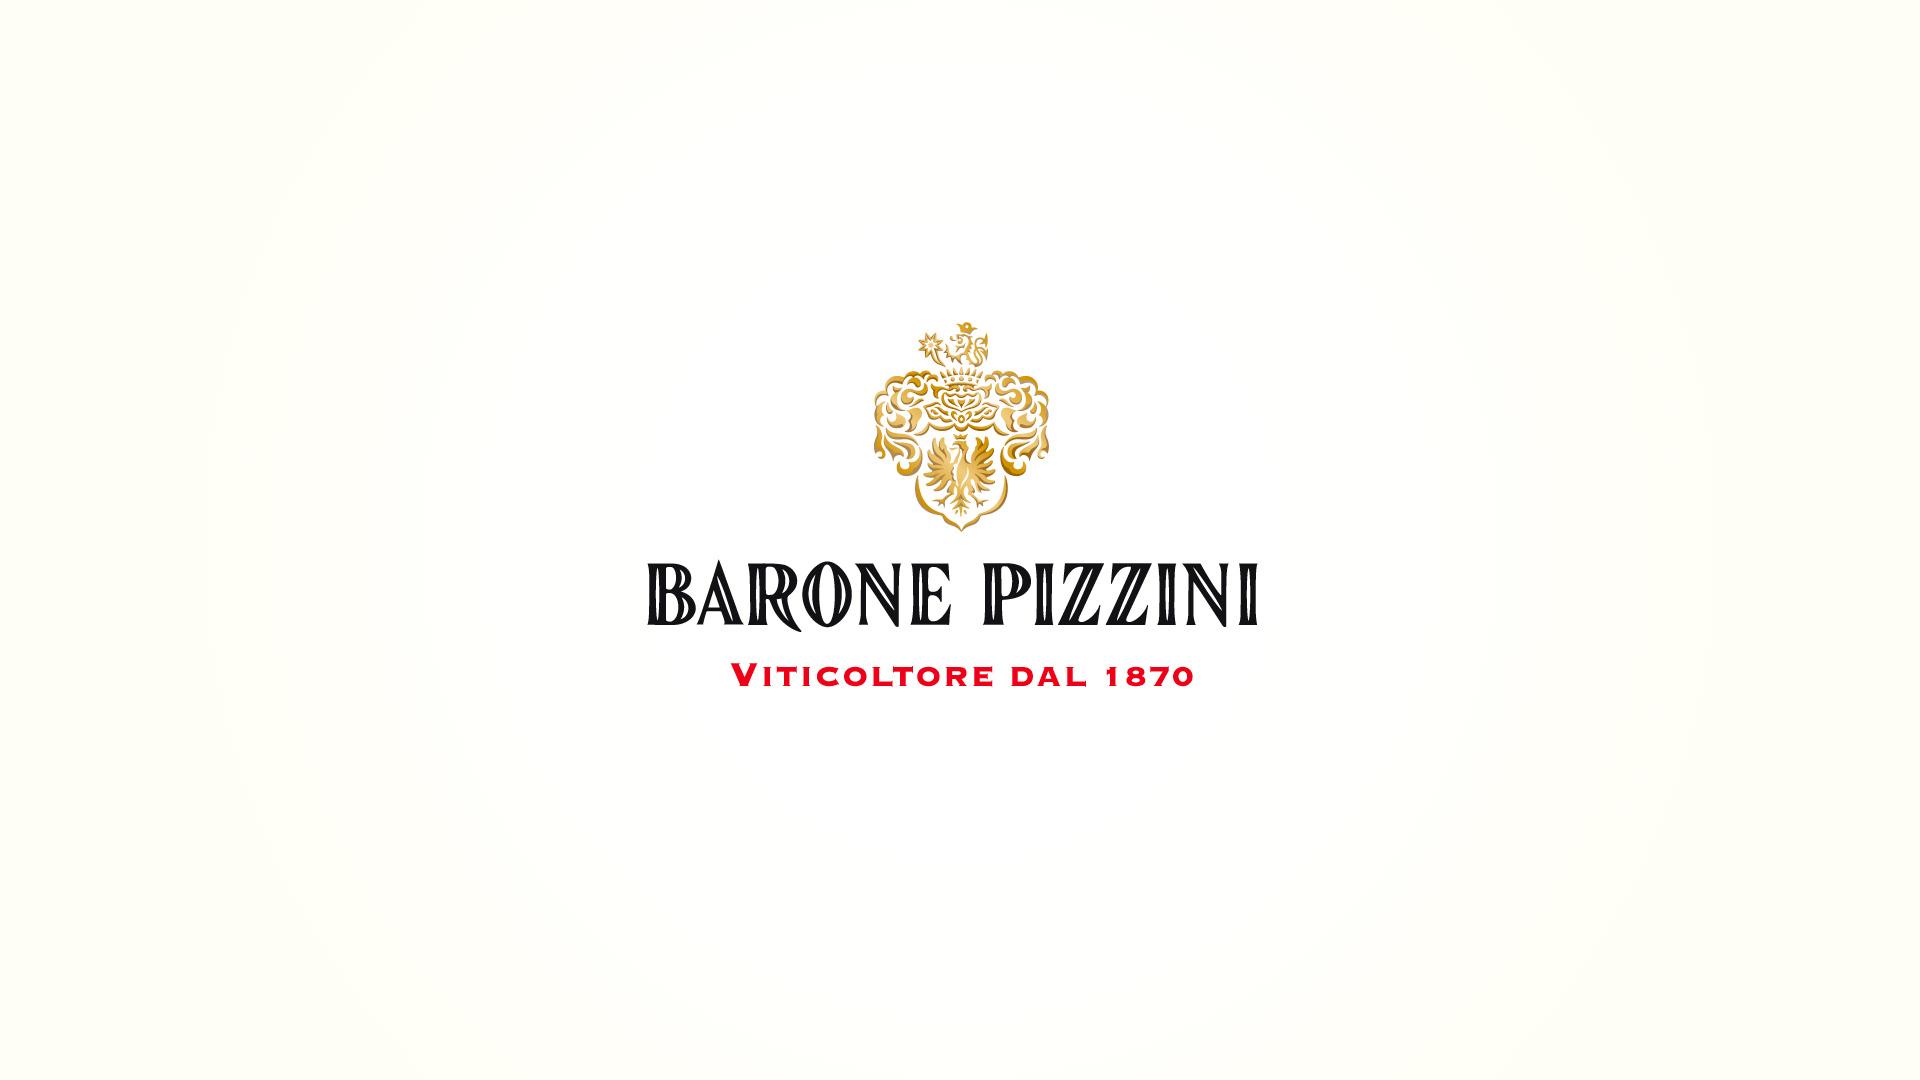 Barone Pizzini brand